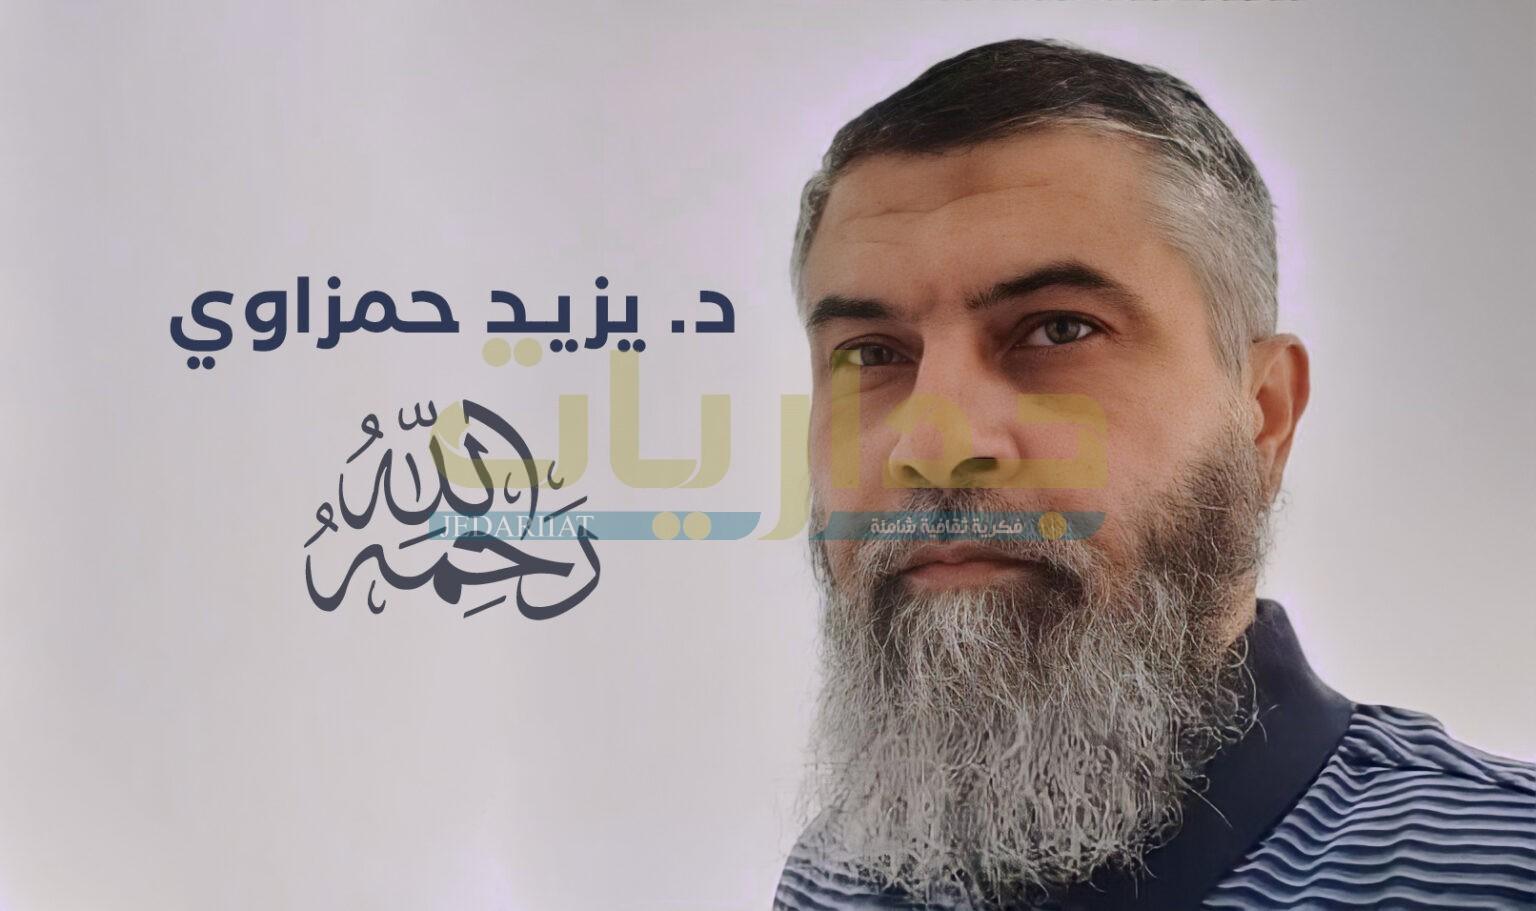 د. يزيد عمر حمزاوي